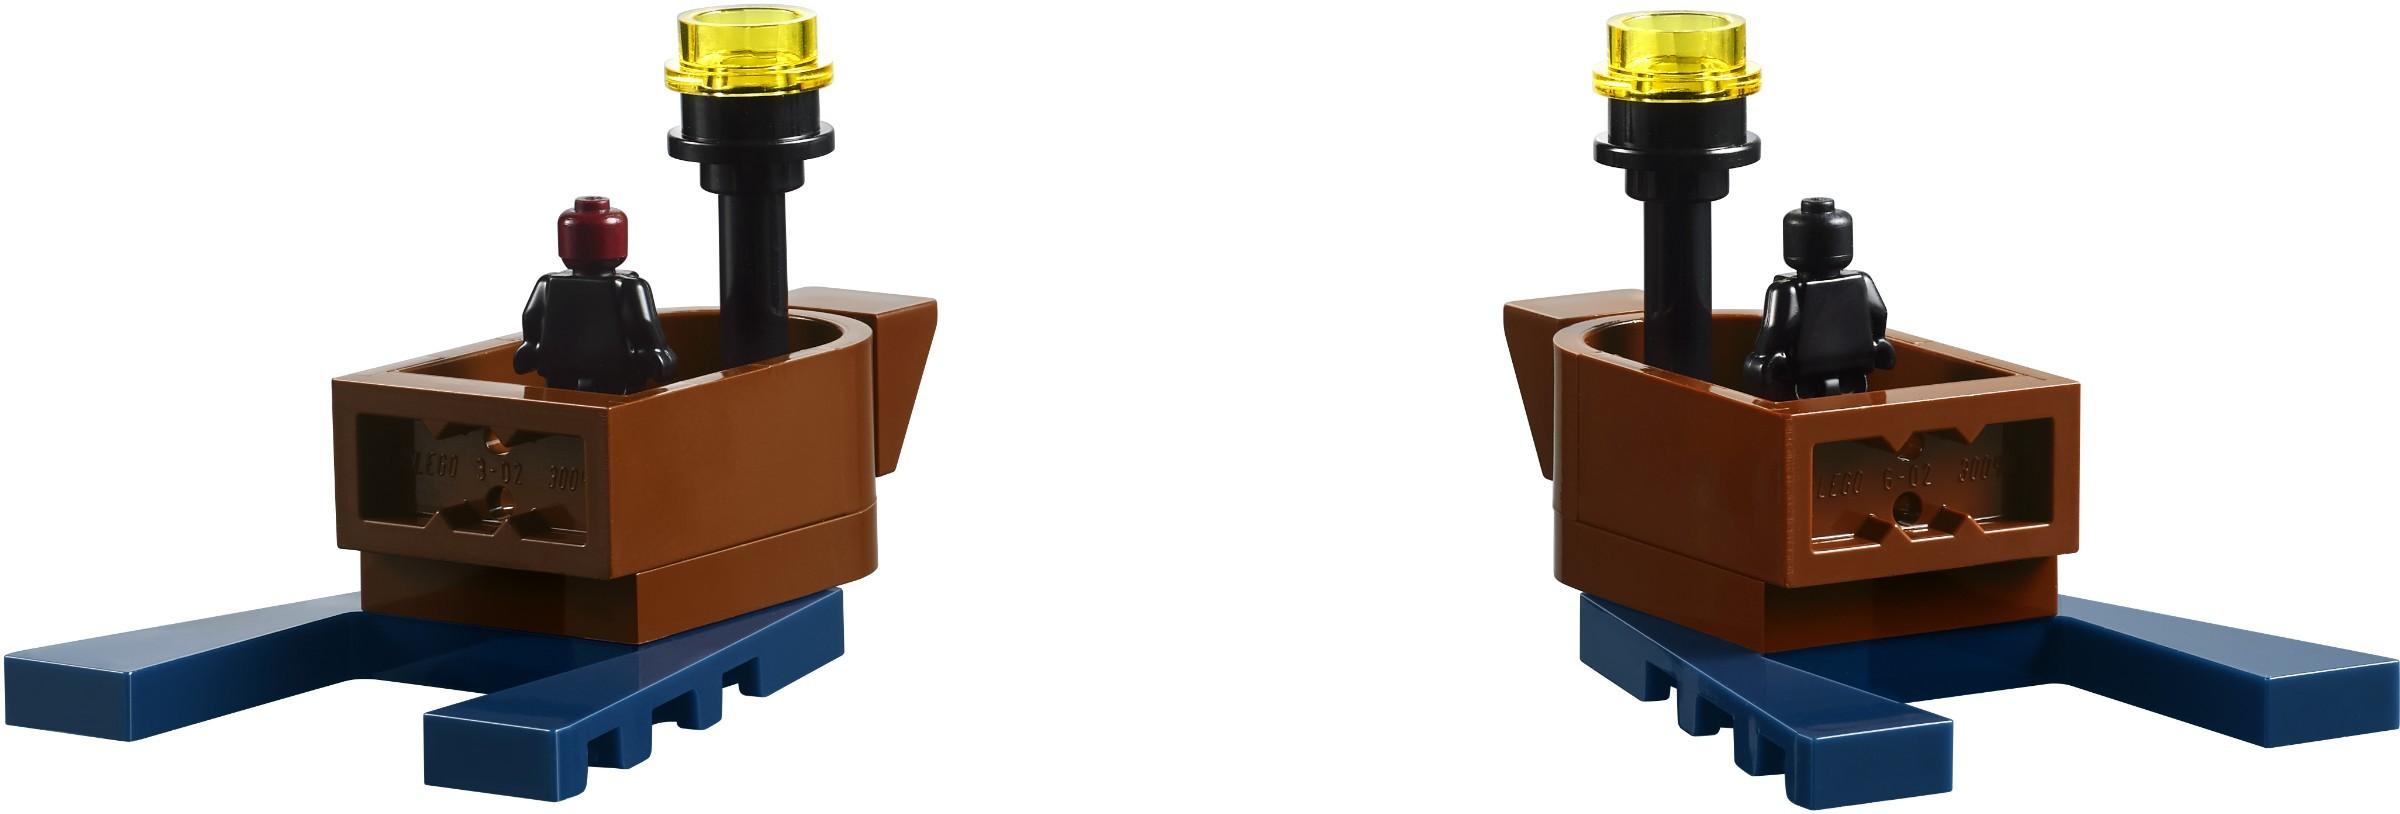 lego-harry-potter-hogwarts-castle-71043-boote-1-2018 zusammengebaut.com